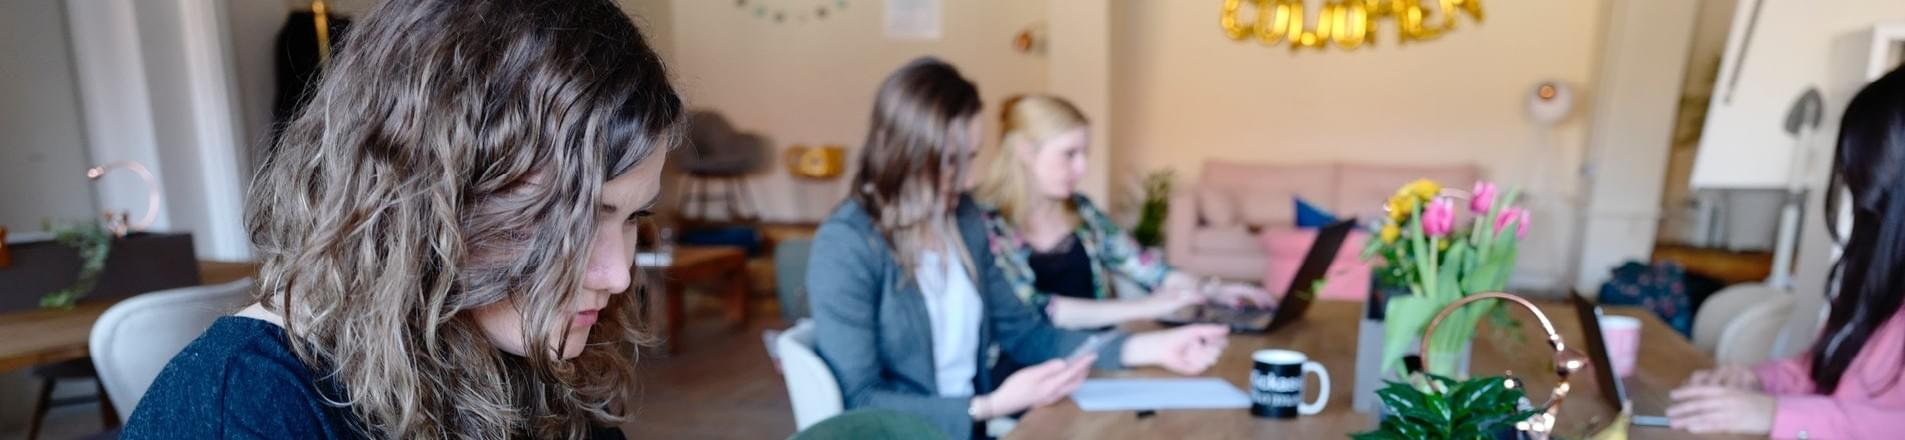 #LDNTechWeek: Women in technology